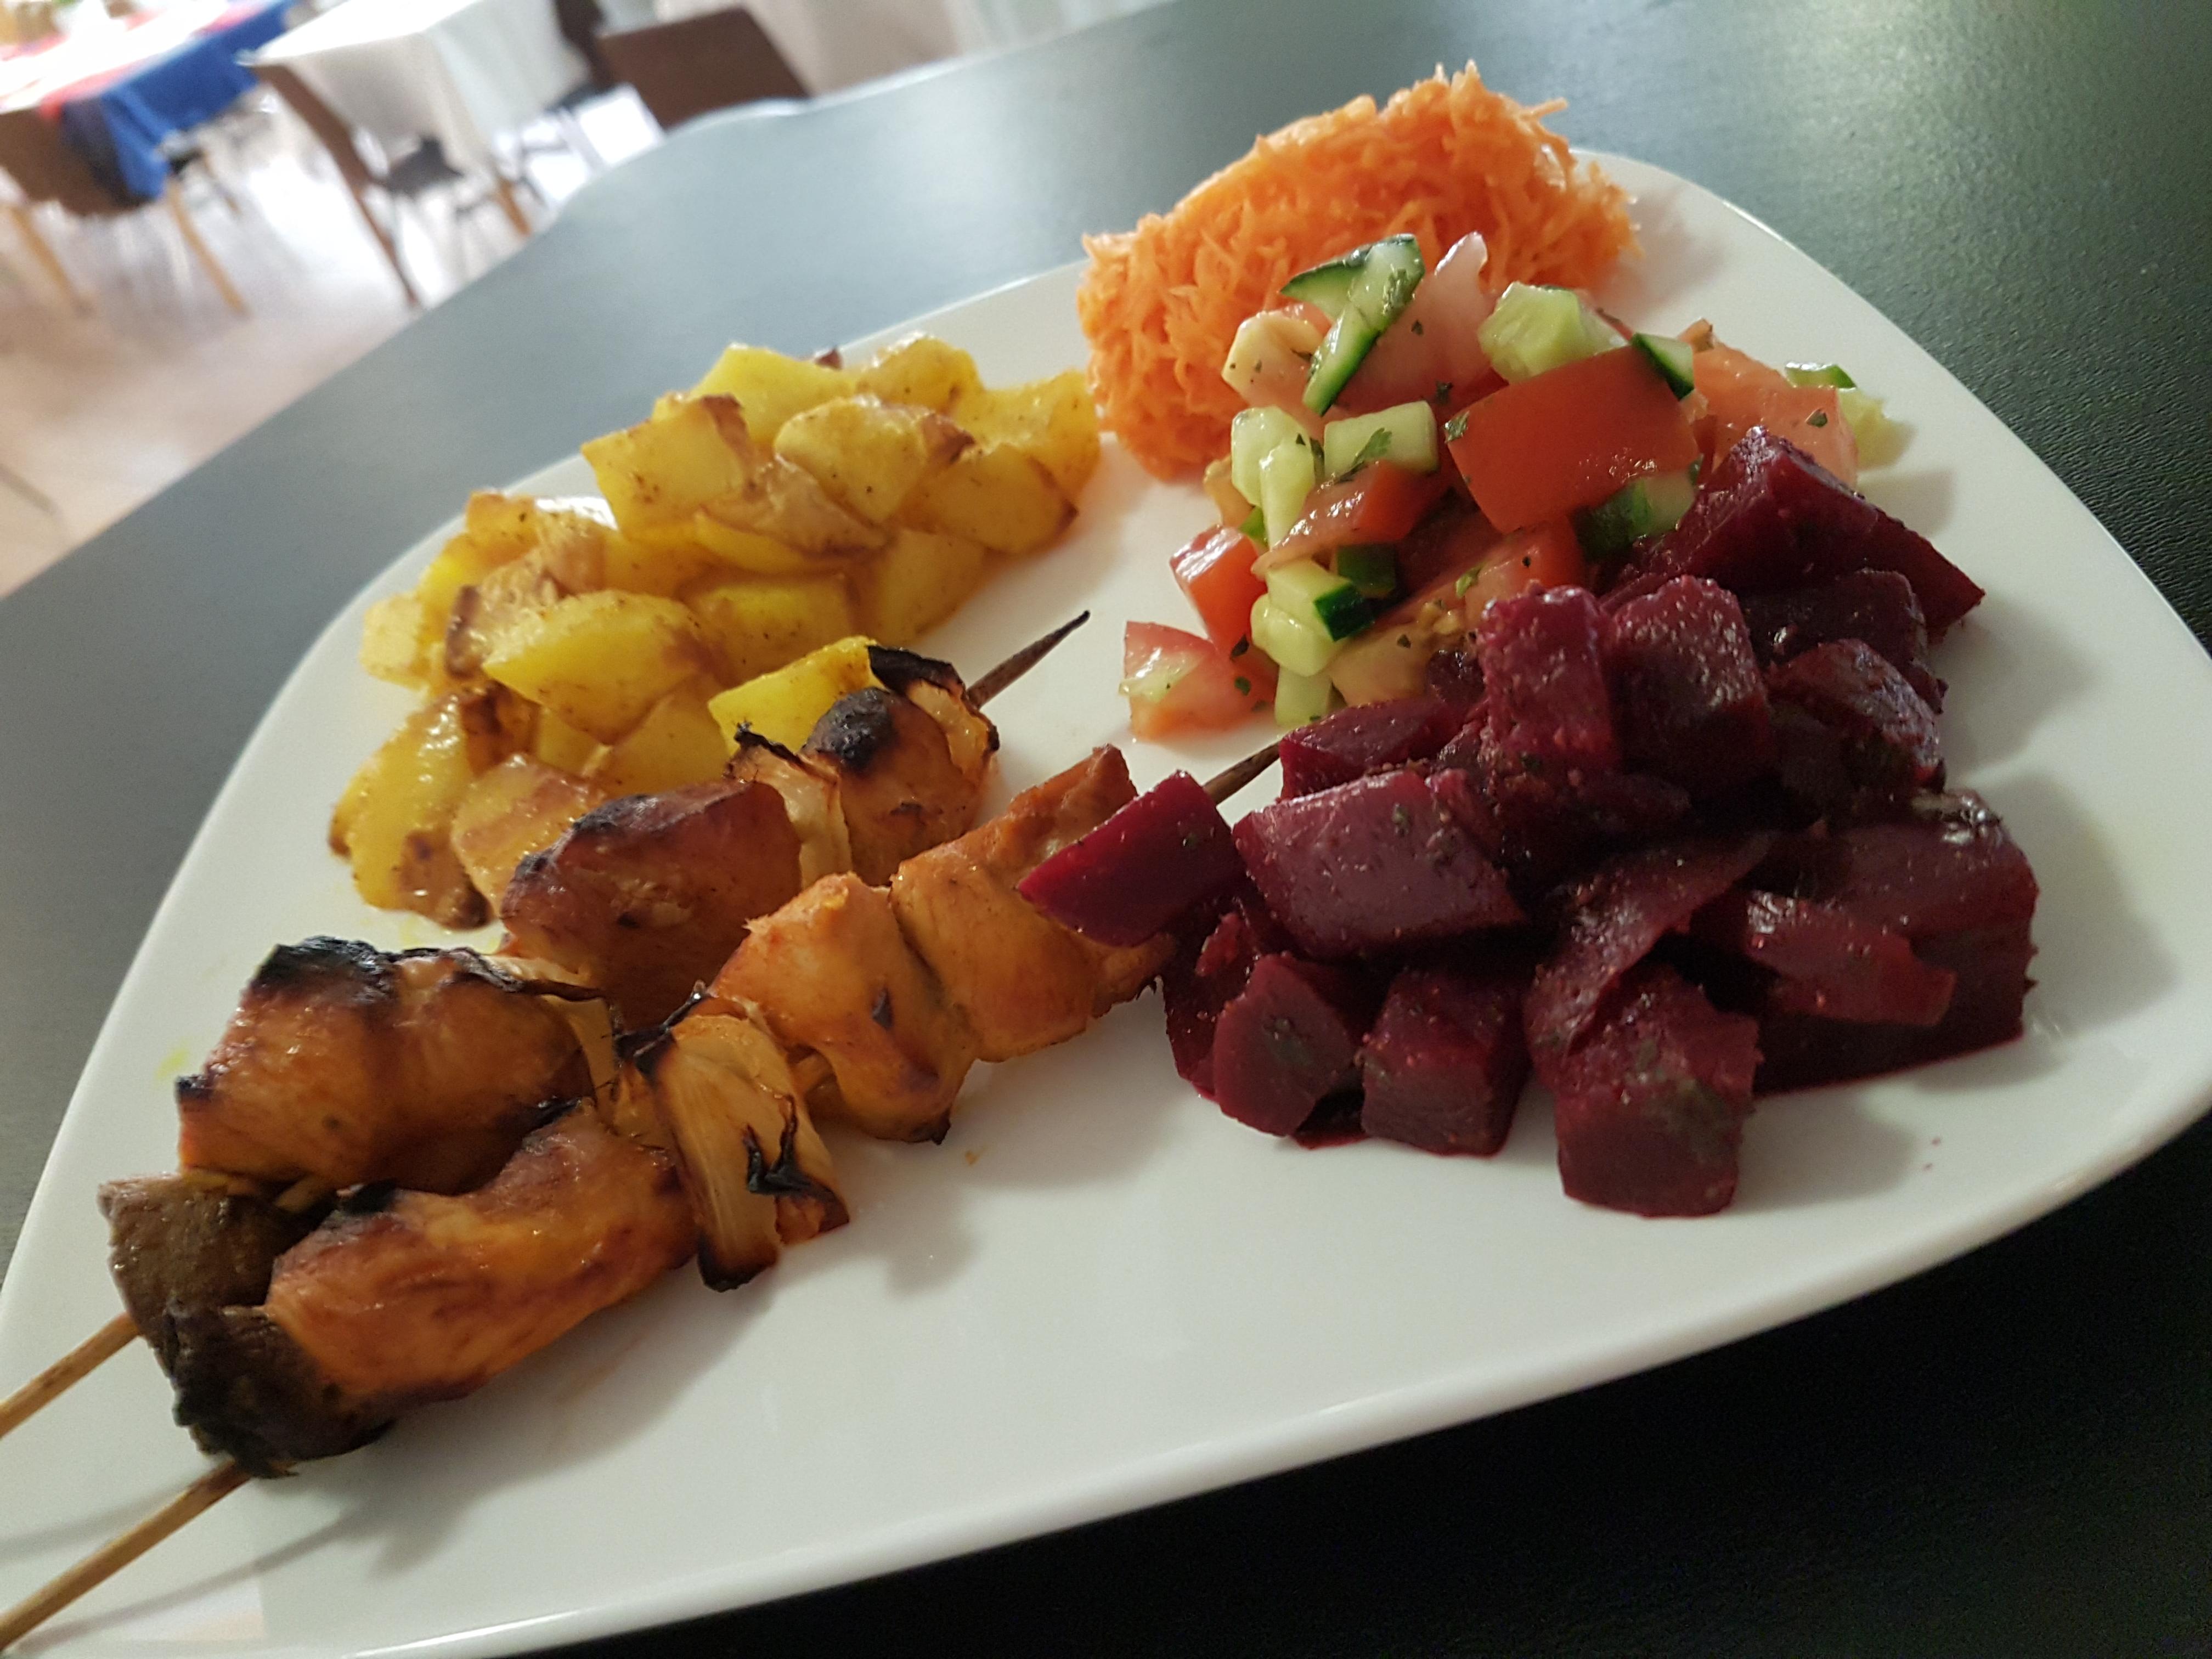 Teamim Koscher Catering